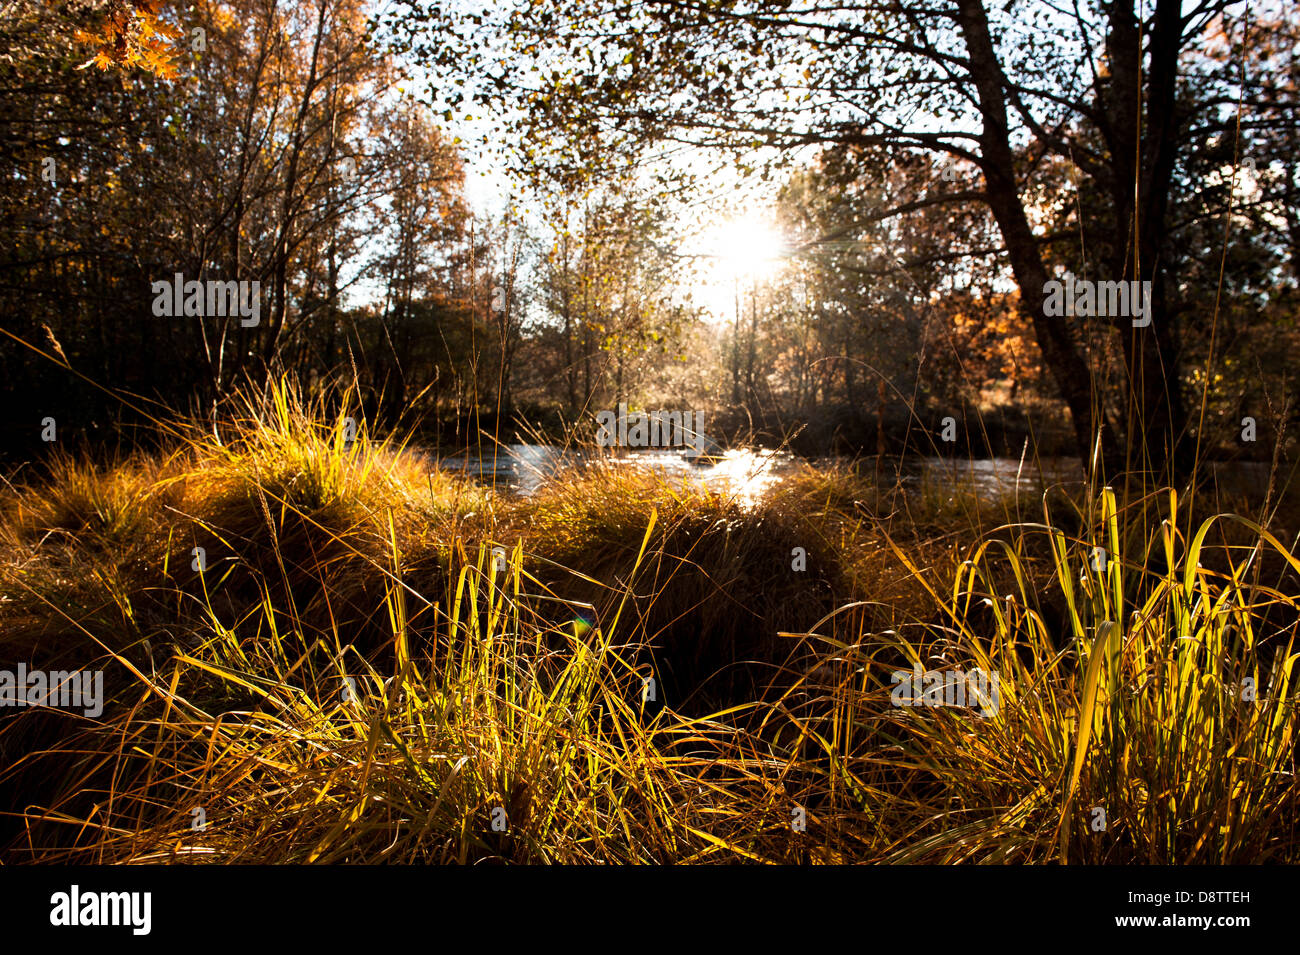 paisaje, landscape, scenery, scene - Stock Image